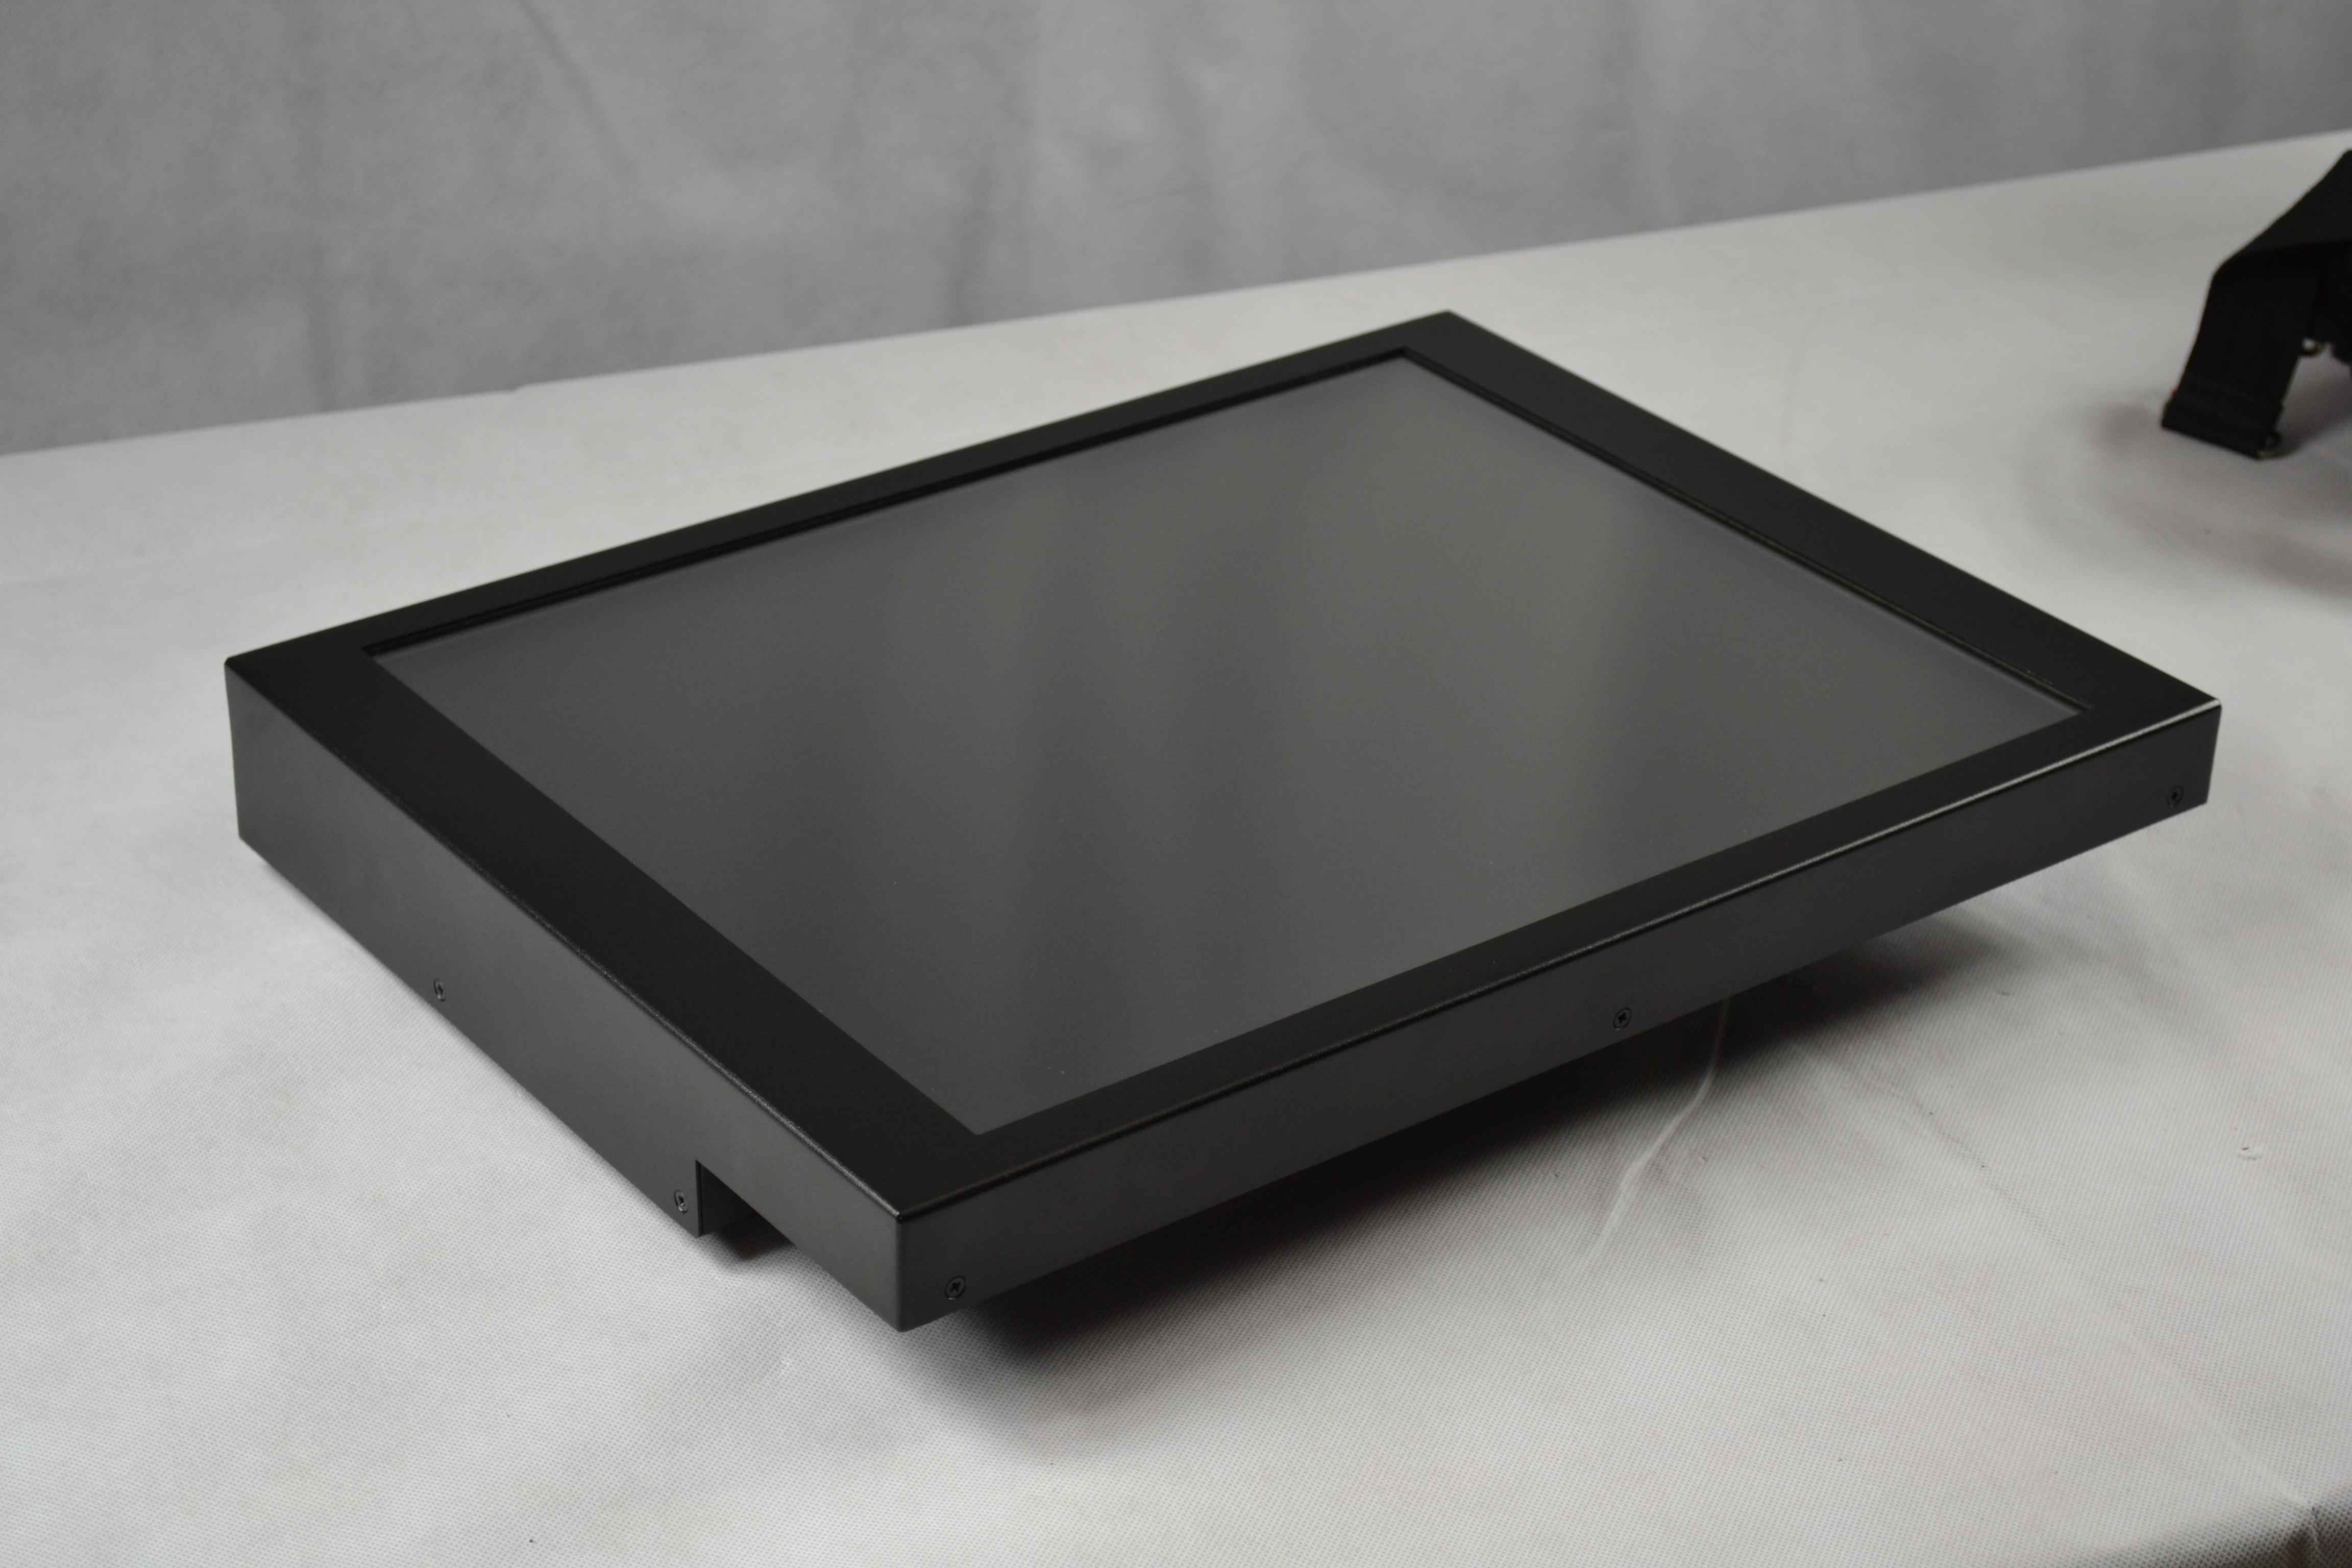 Touchscreen Panel PC UK, VESA Mount, Nemacom Industrial Computing